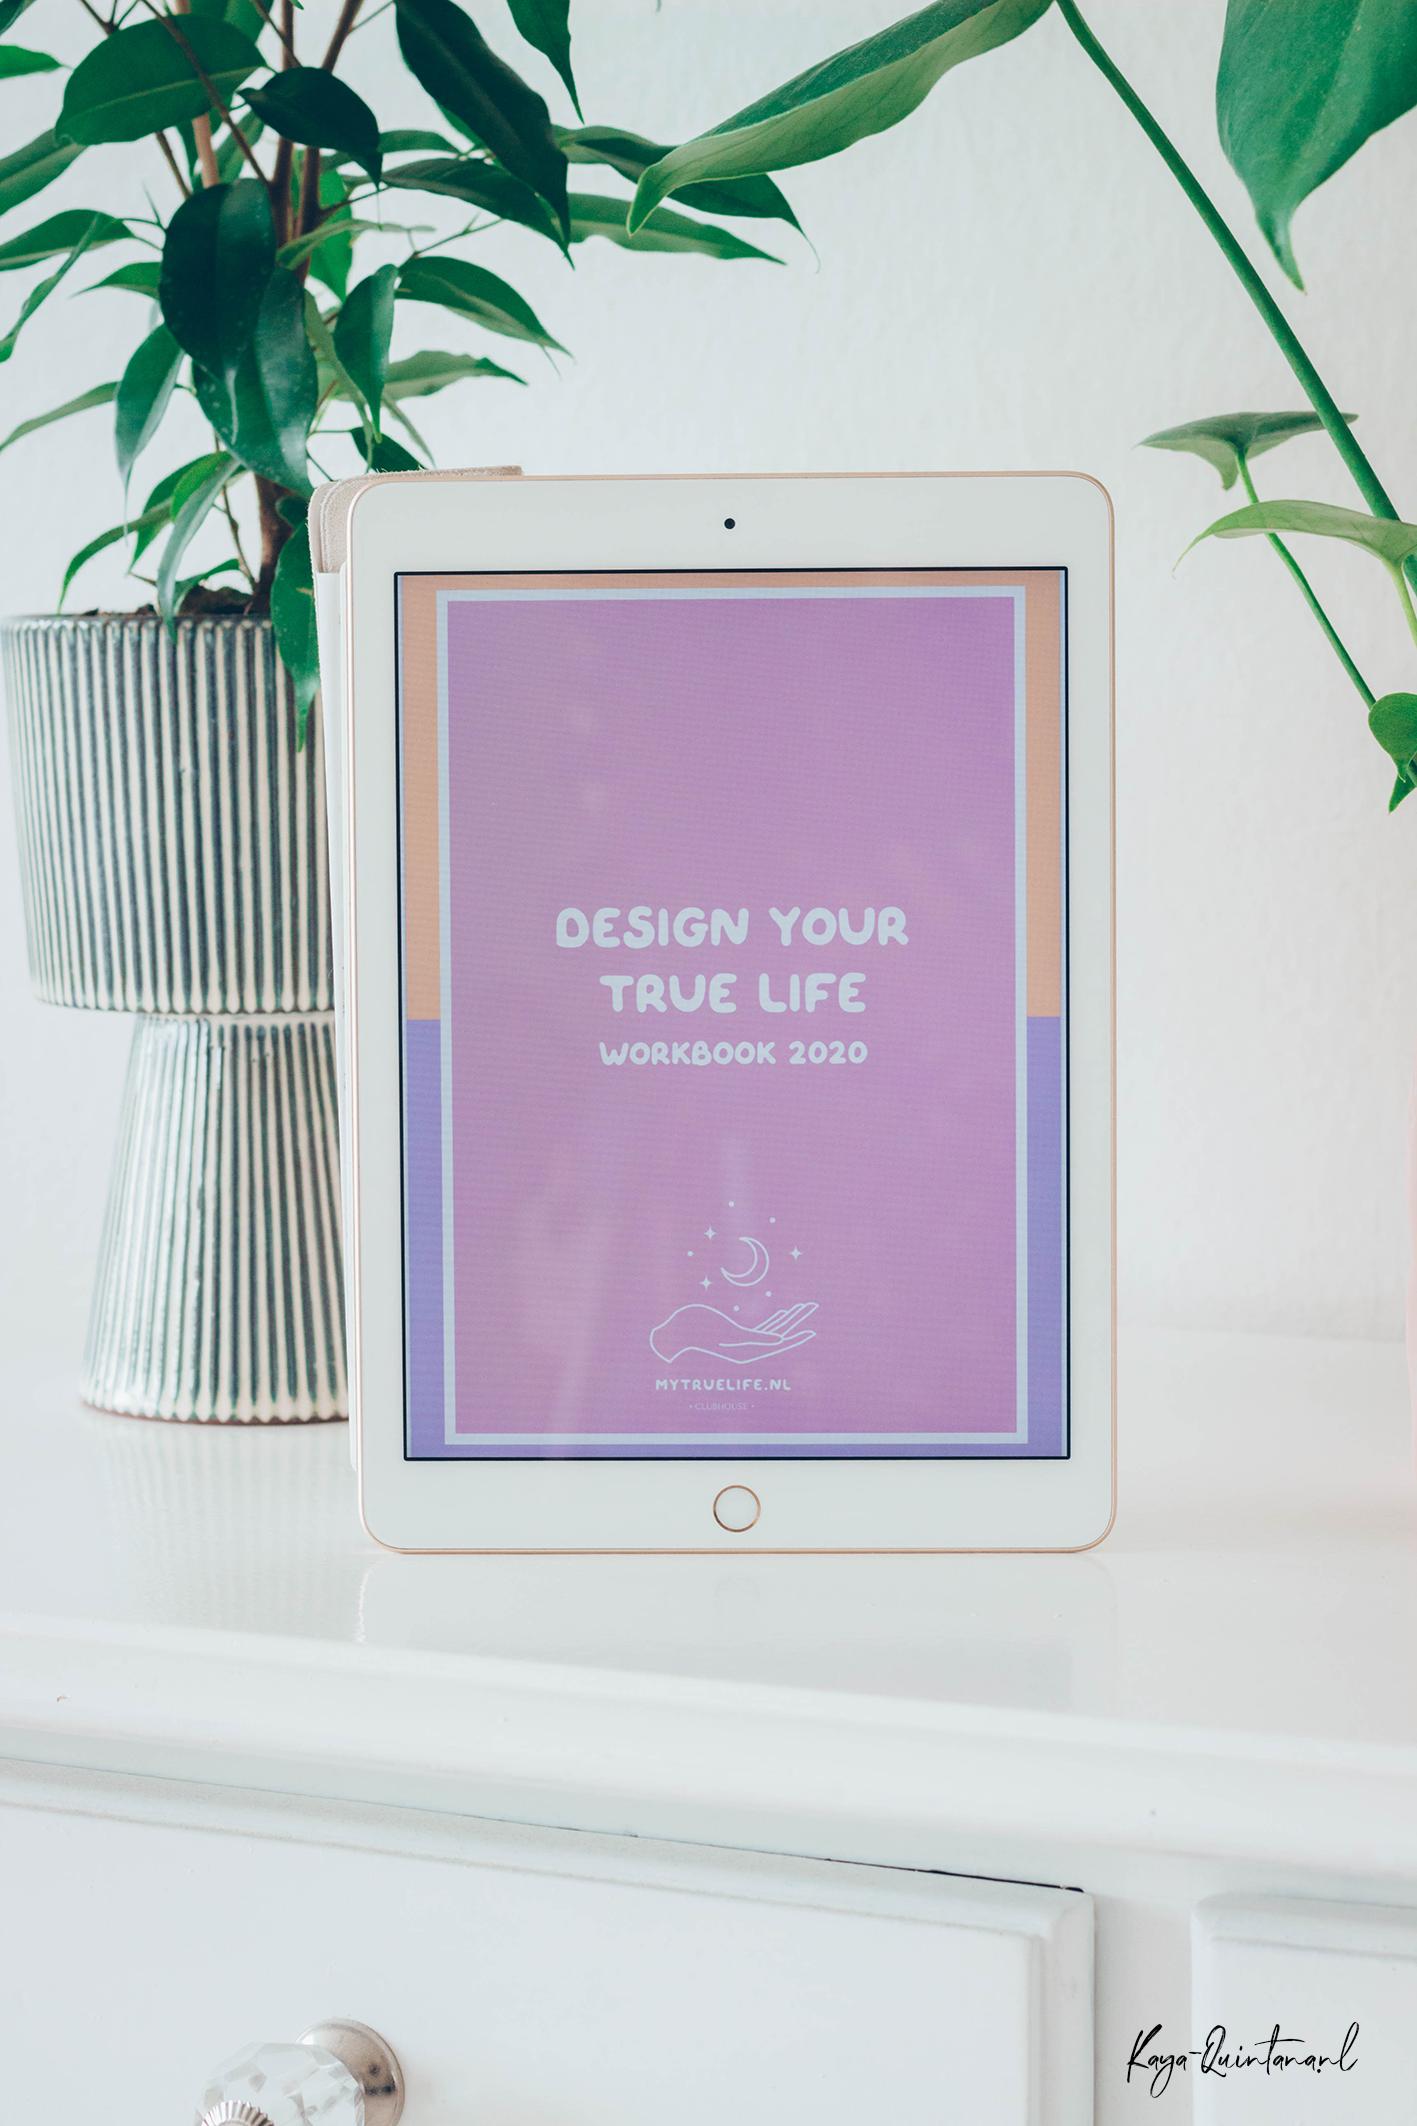 Design your true life workbook